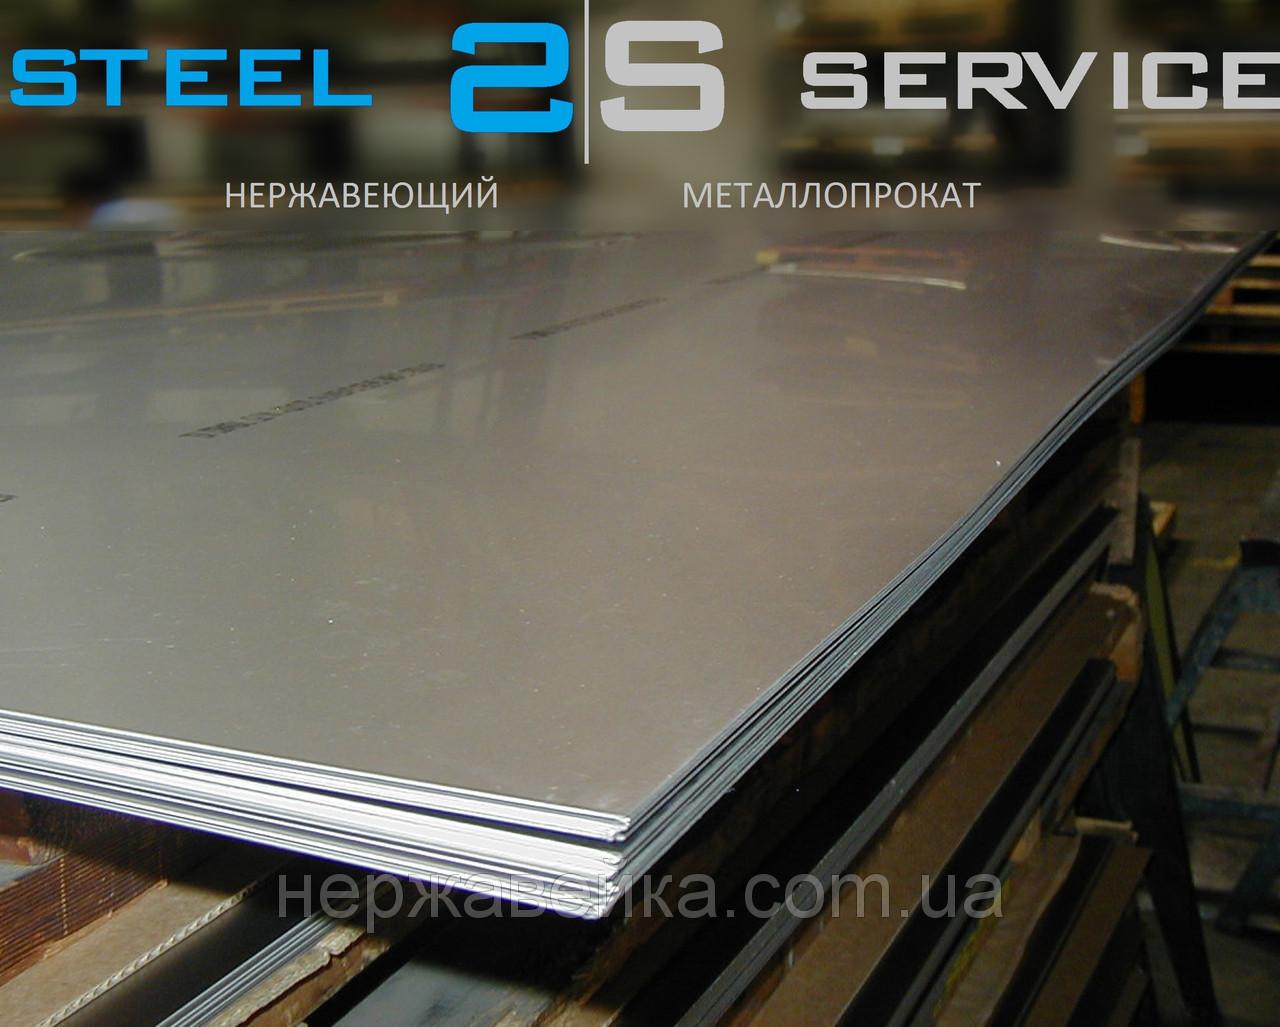 Нержавейка лист 5х1500х6000мм  AISI 316L(03Х17Н14М3) F1 - горячекатанный,  кислотостойкий